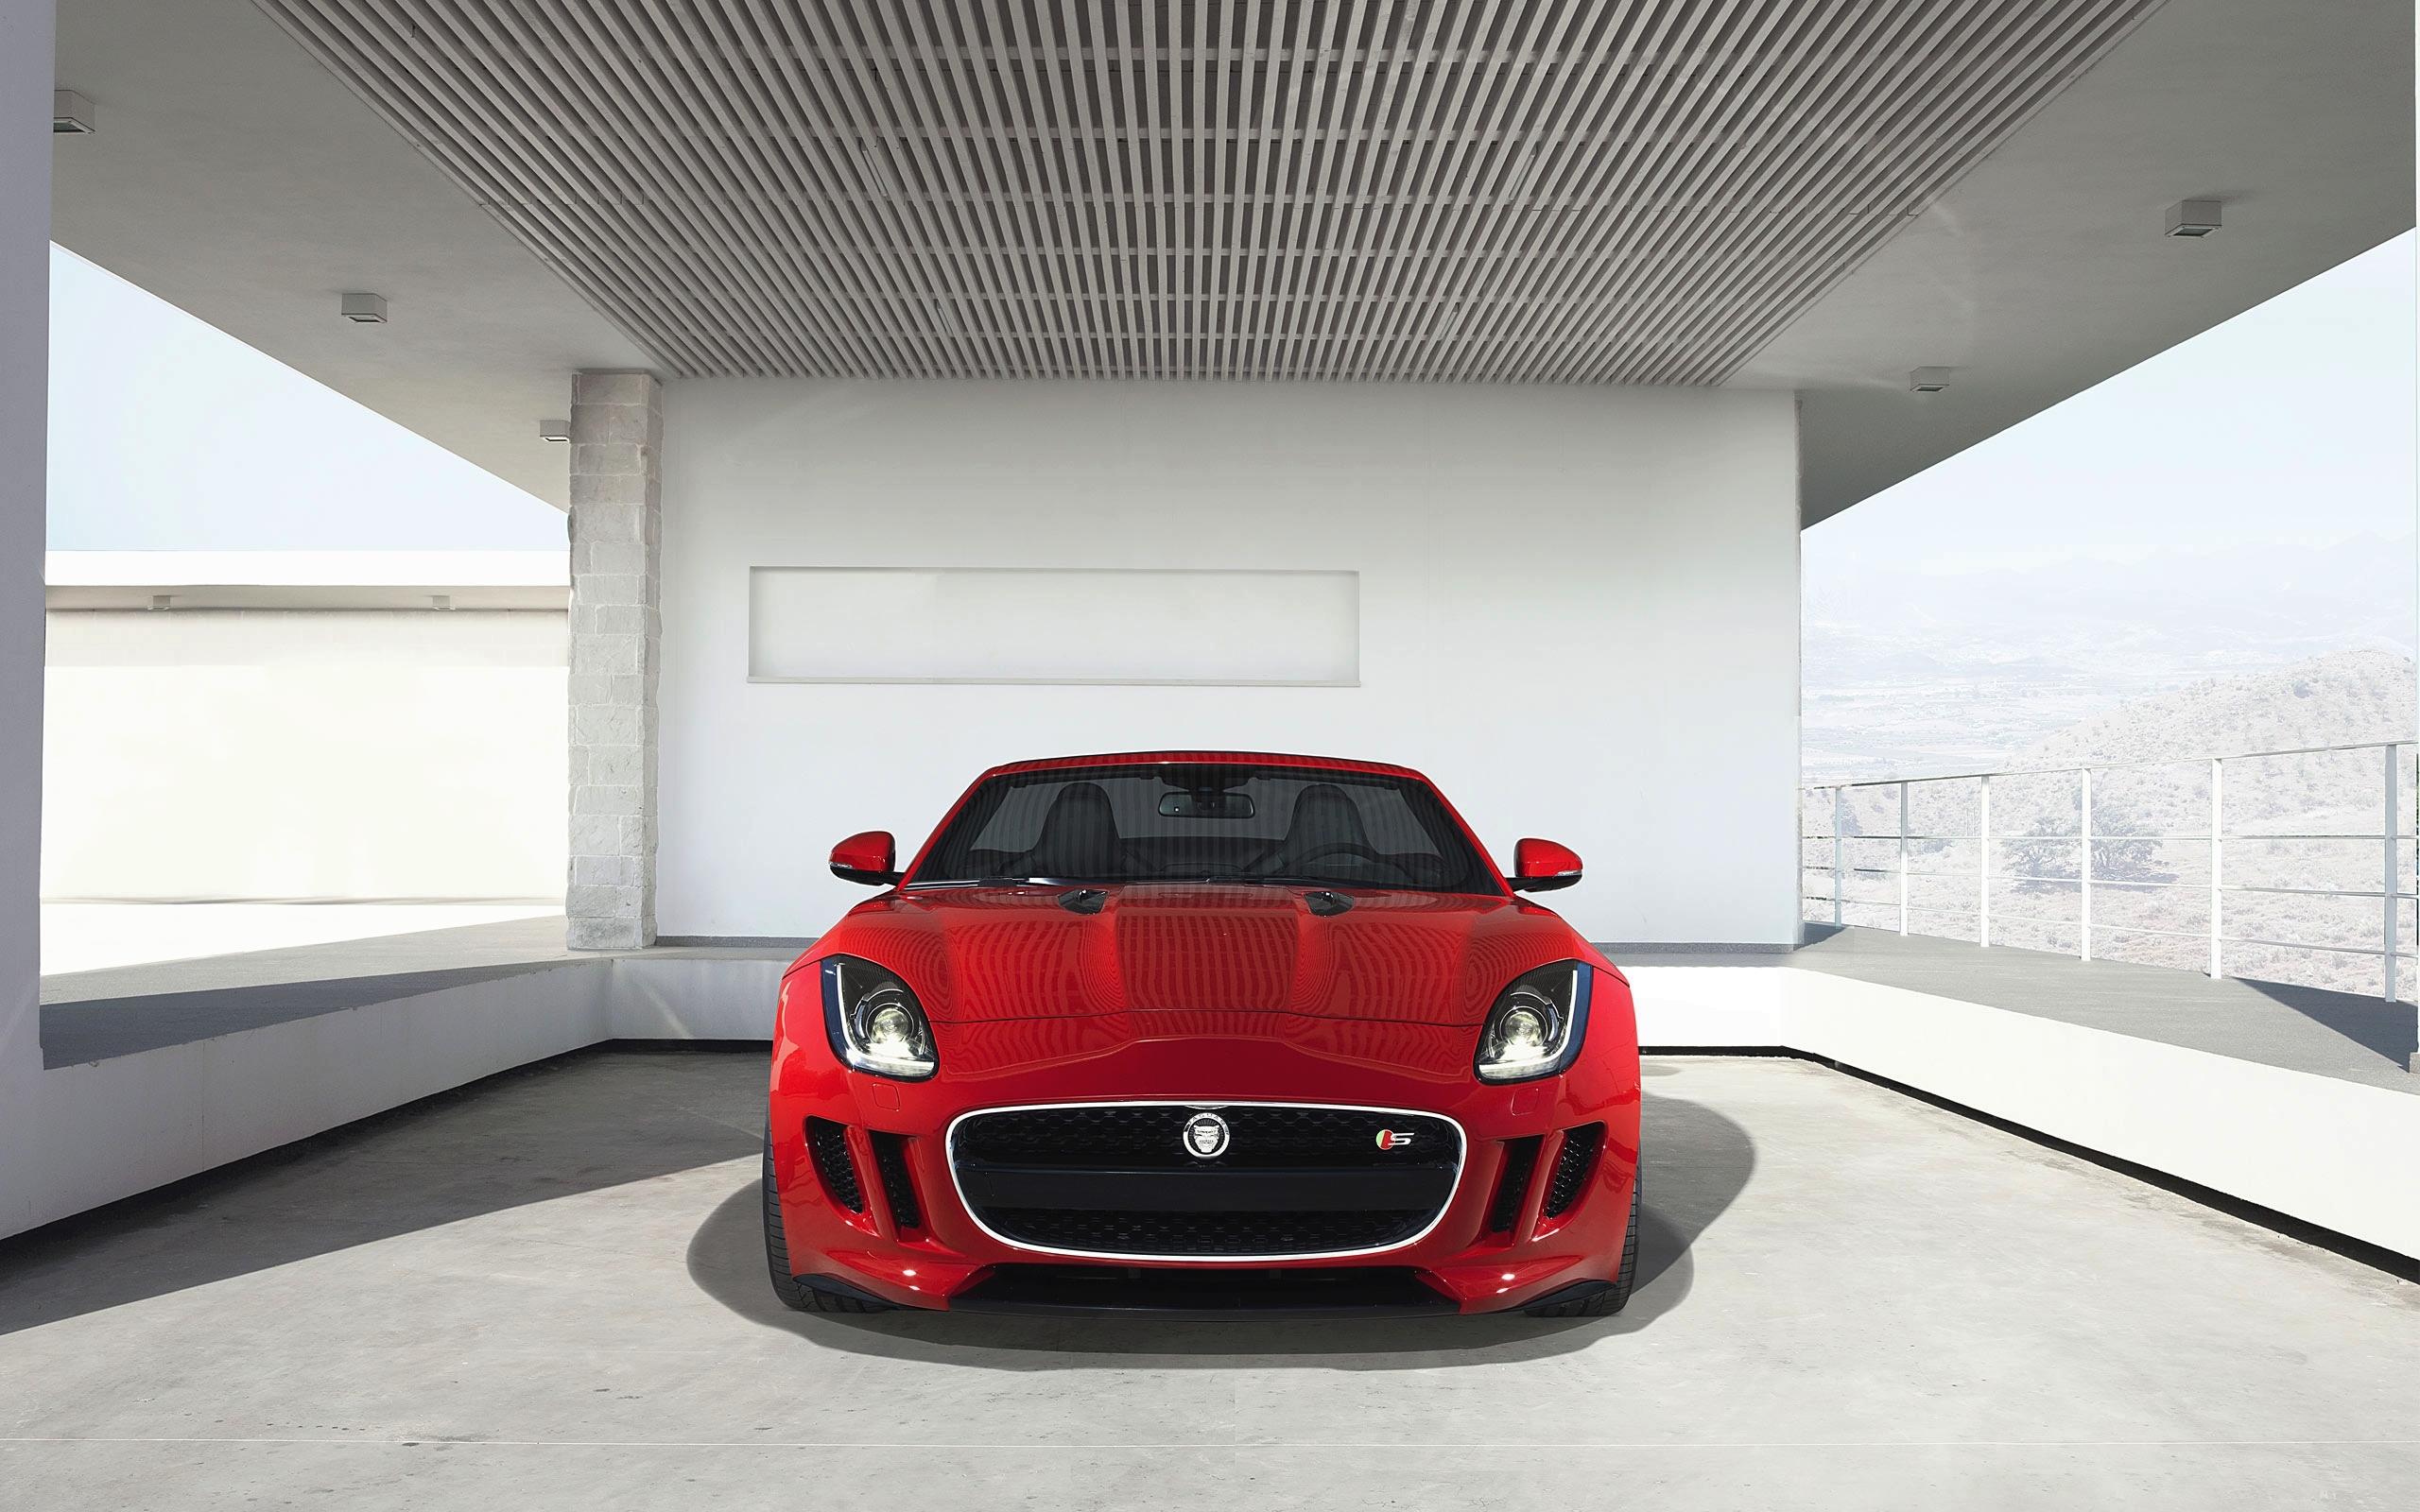 Wallpaper Jaguar F Type Red Front View 2560x1600